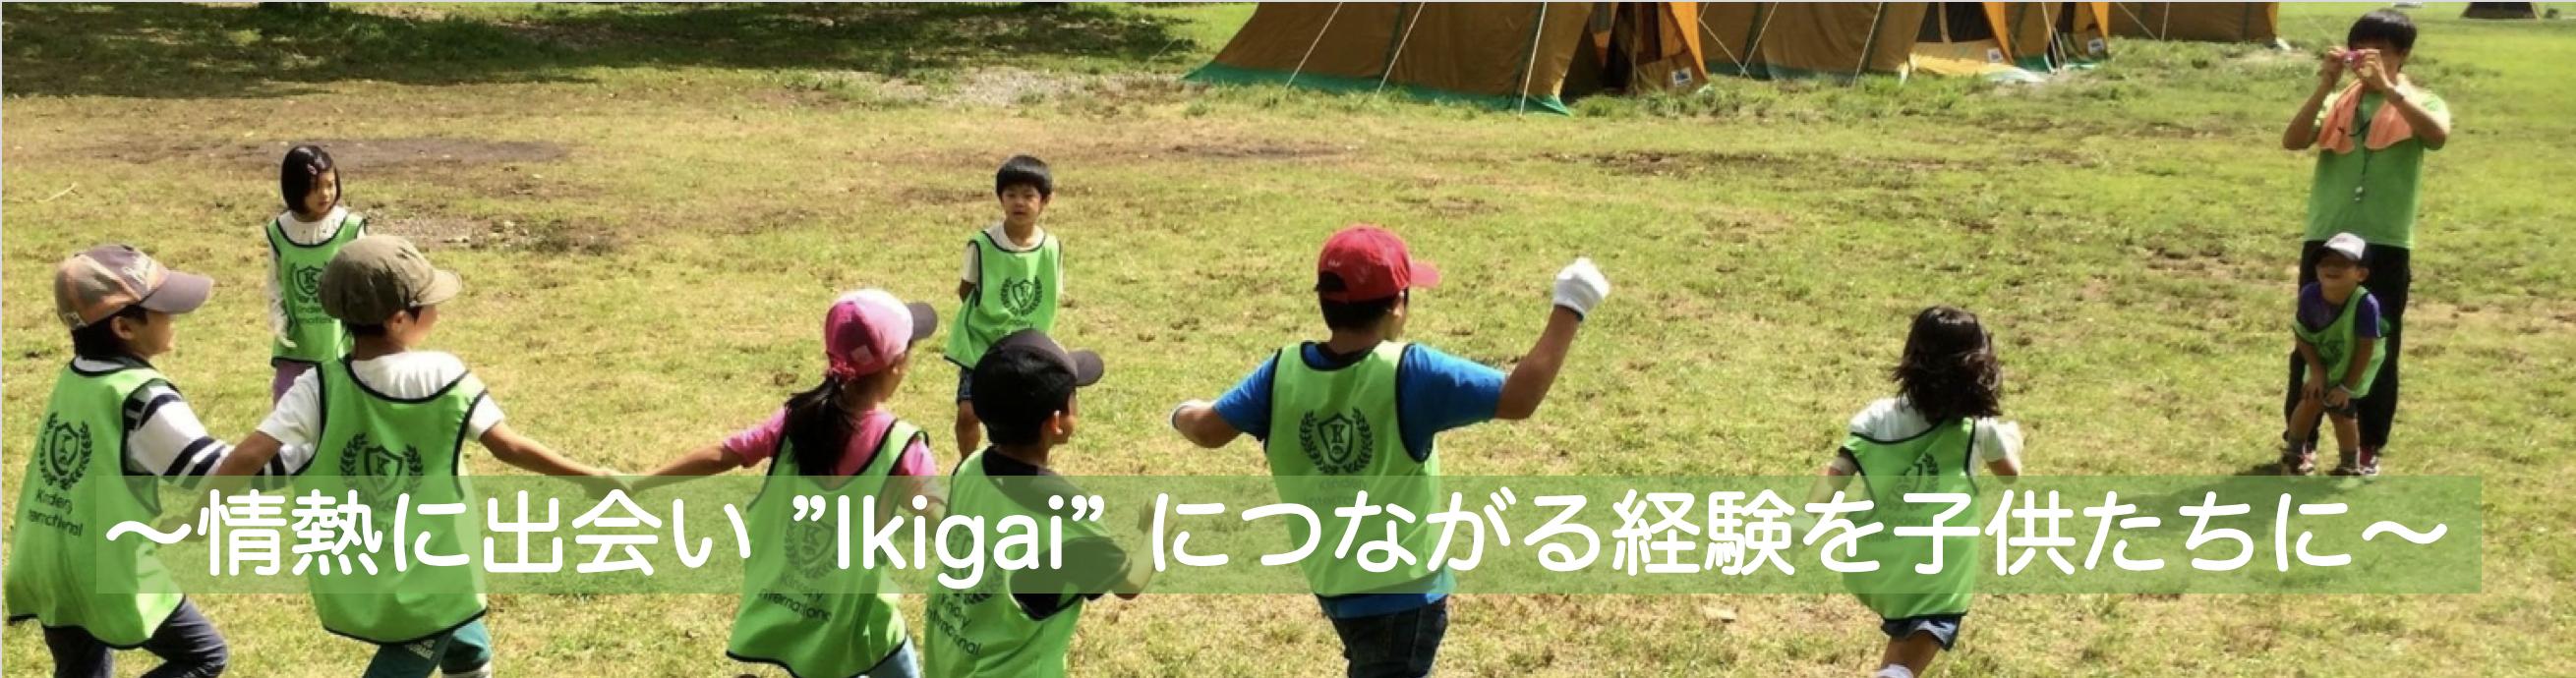 Ikigaiに出逢う